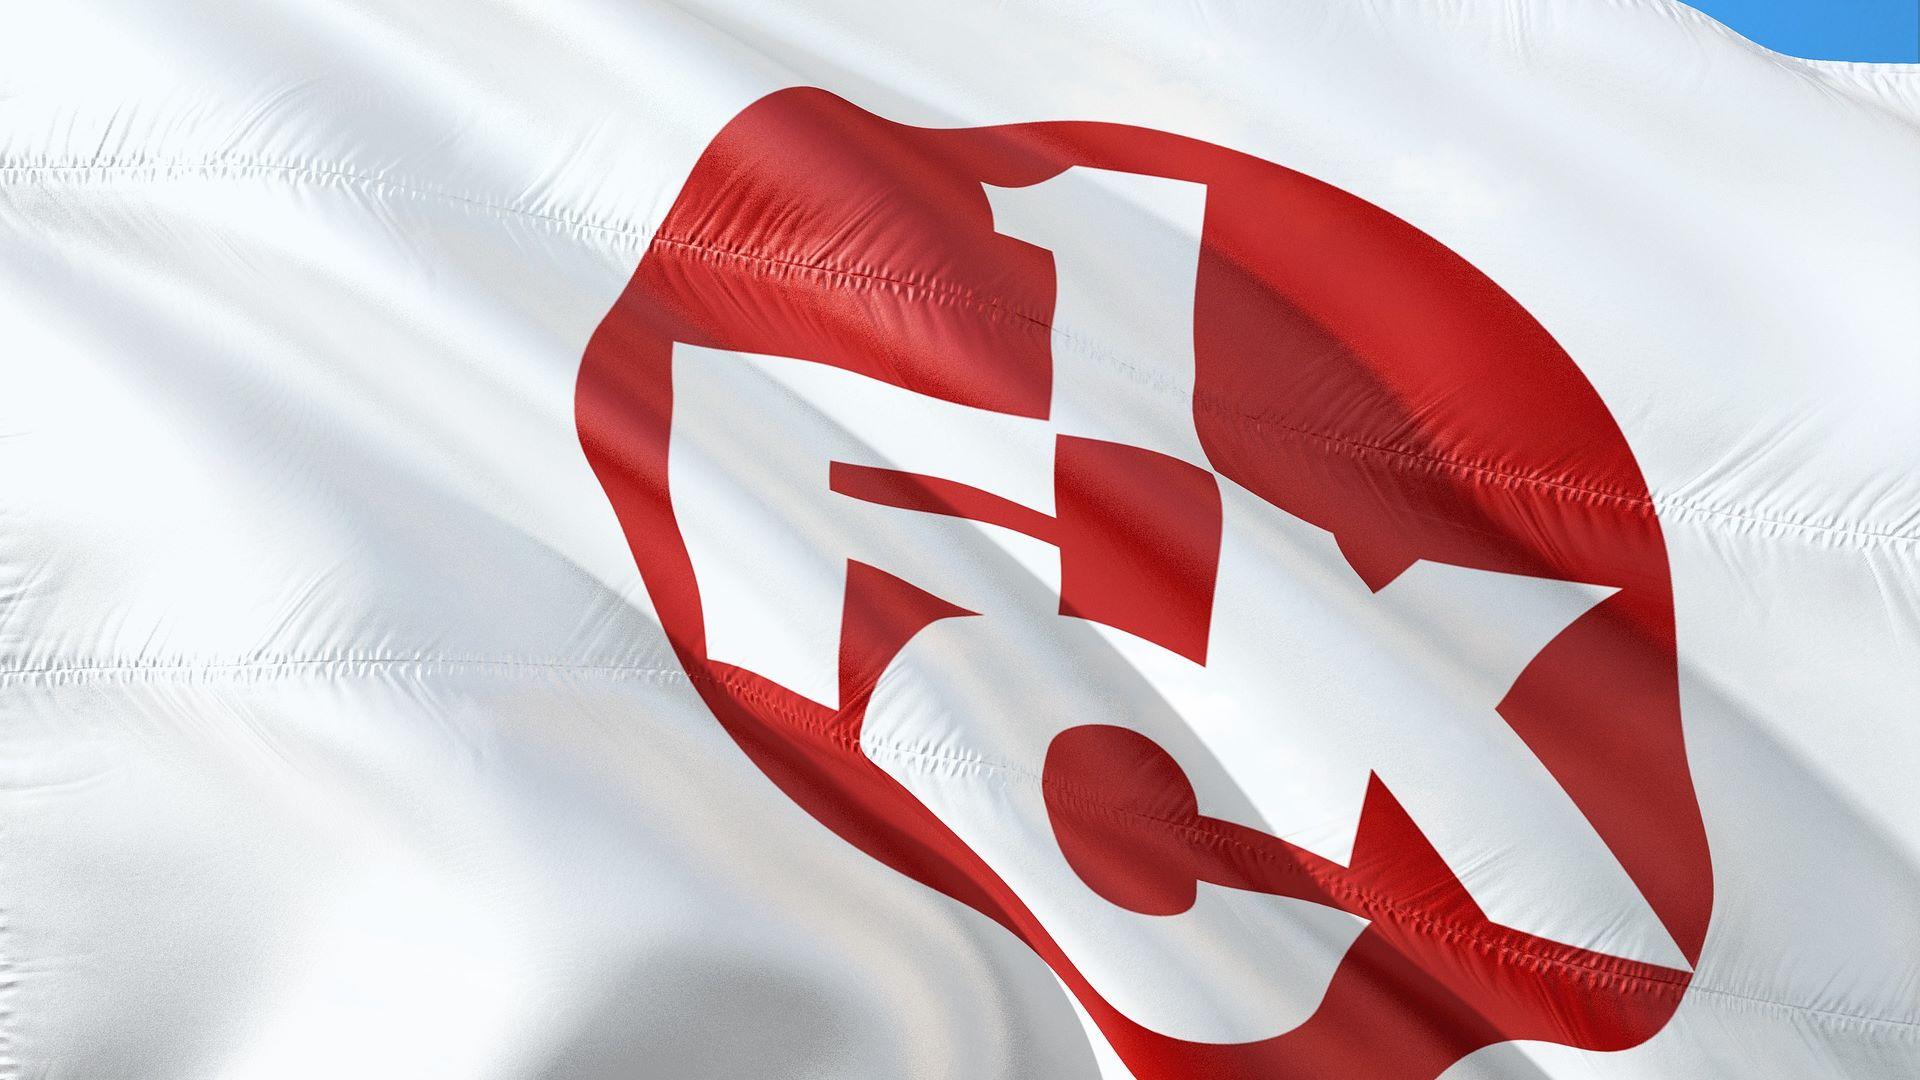 Mittelfeldspieler Anil Aydin wechselt zum 1. FC Kaiserslautern-Image